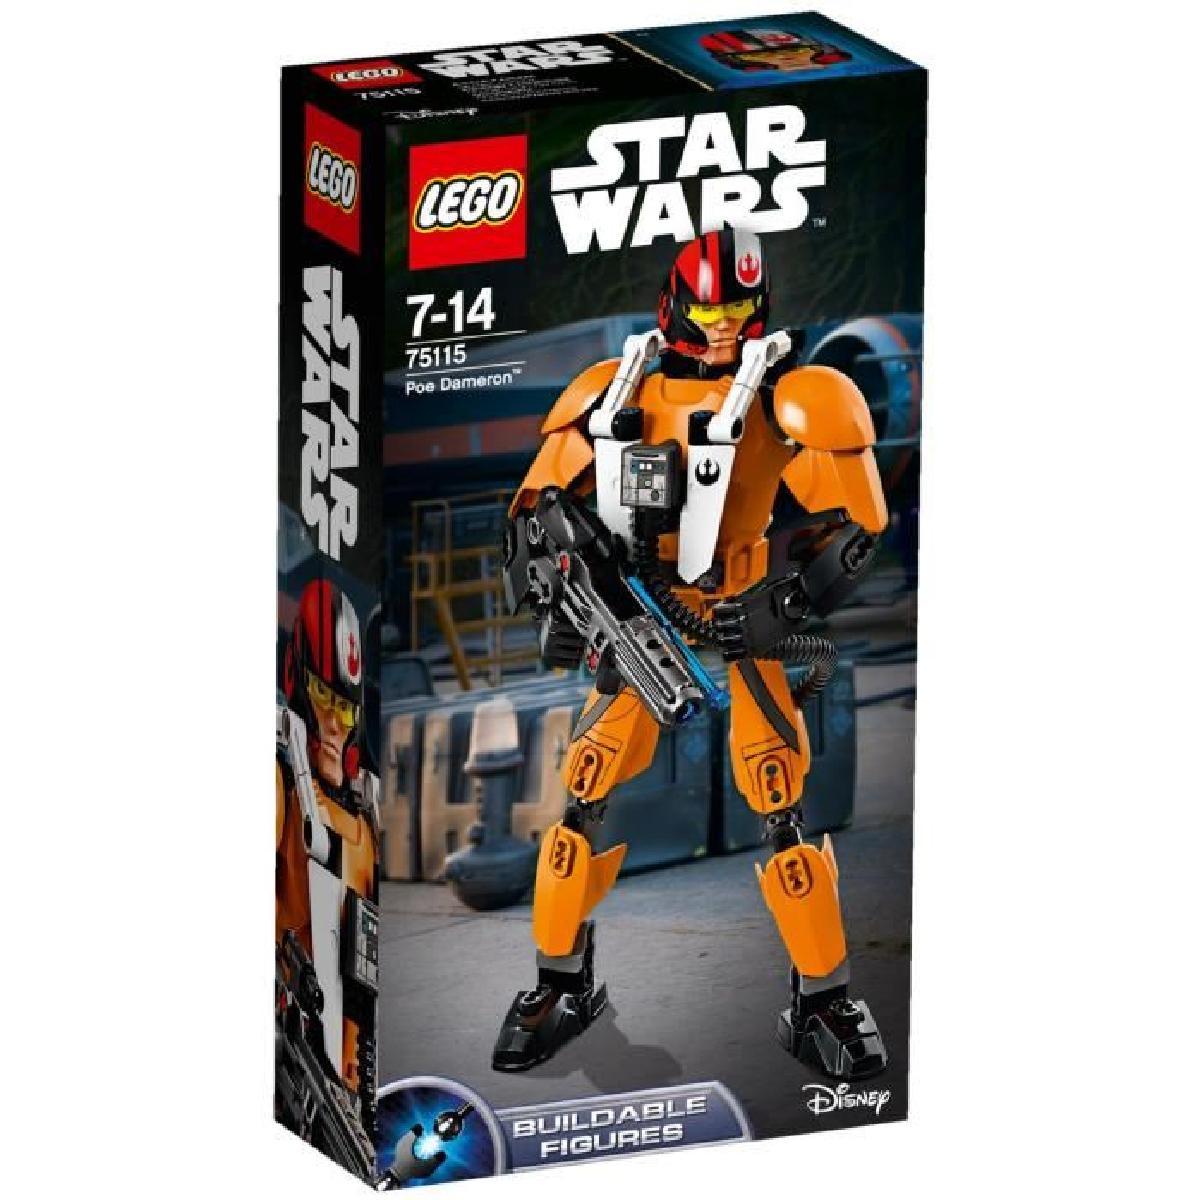 LEGO® Star Wars? 75115 Poe Dameron? Achat / Vente assemblage